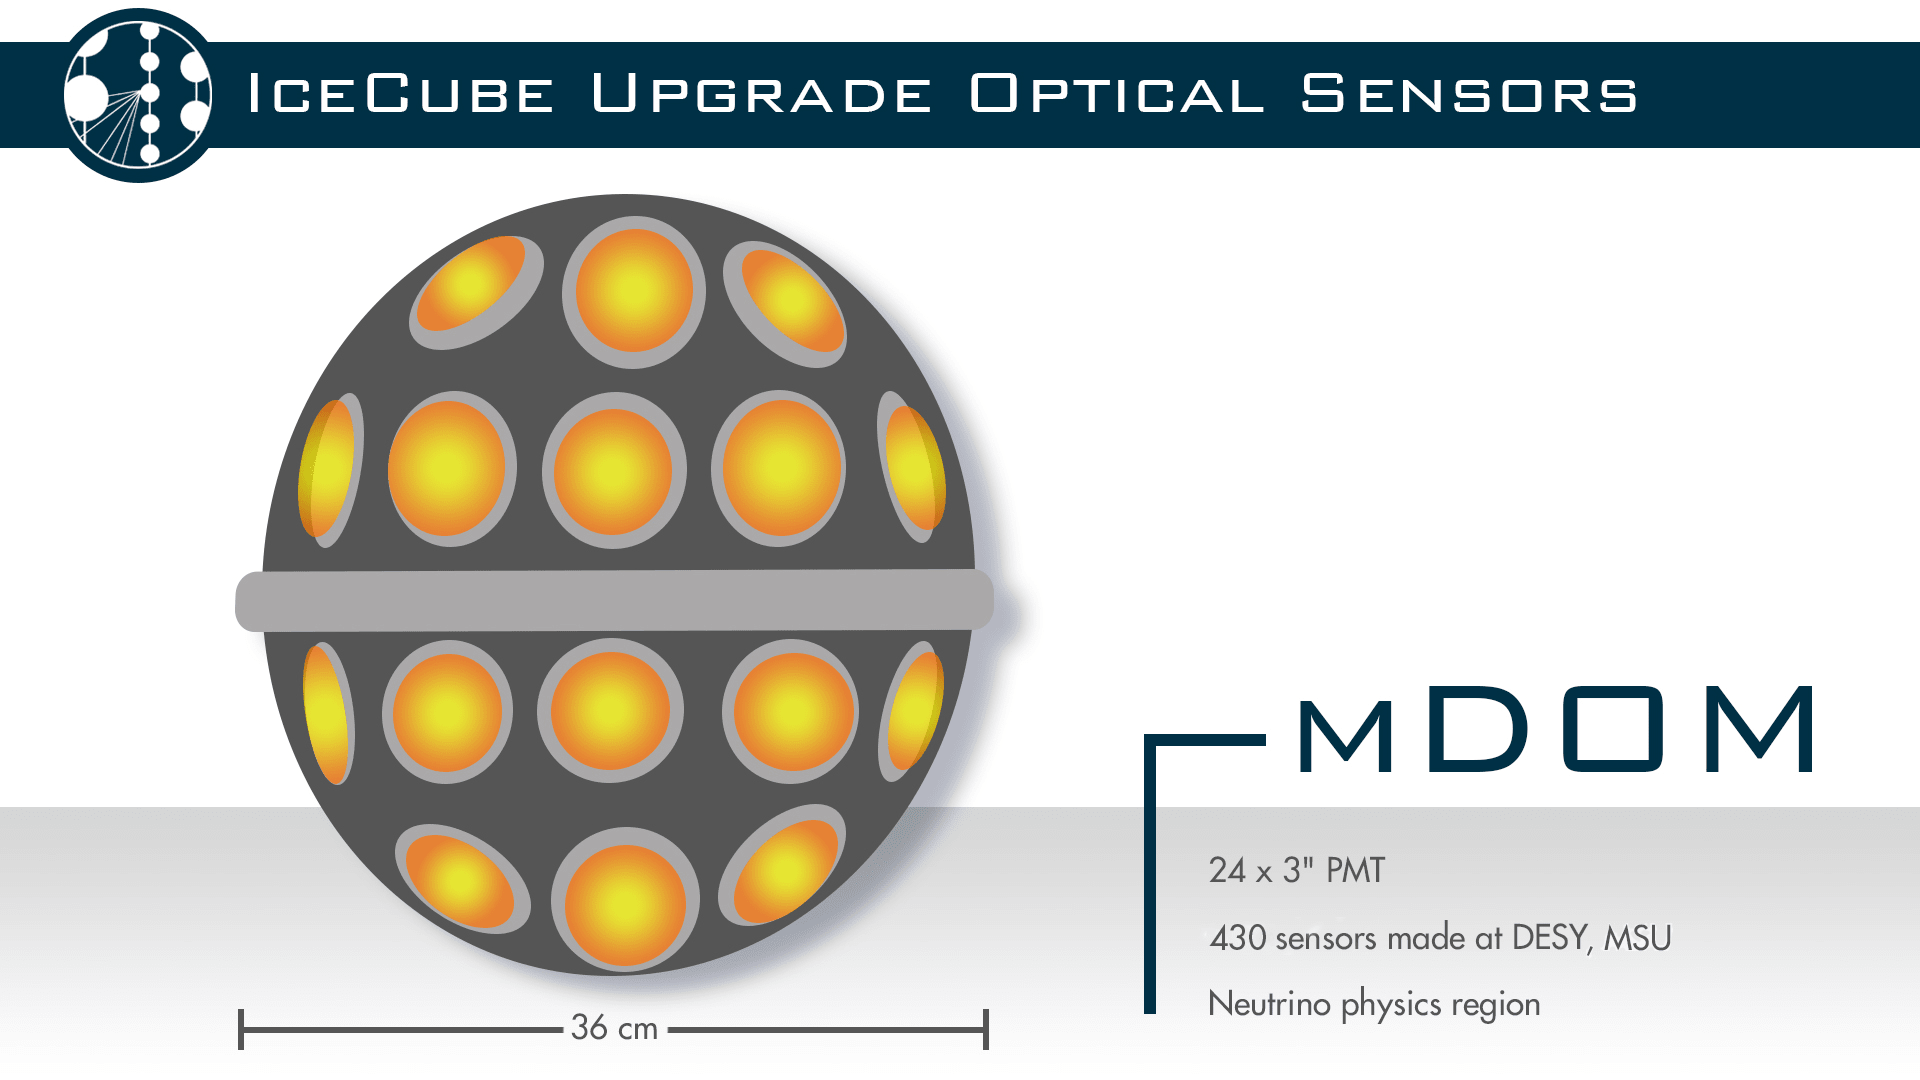 Optical sensor: mDOM